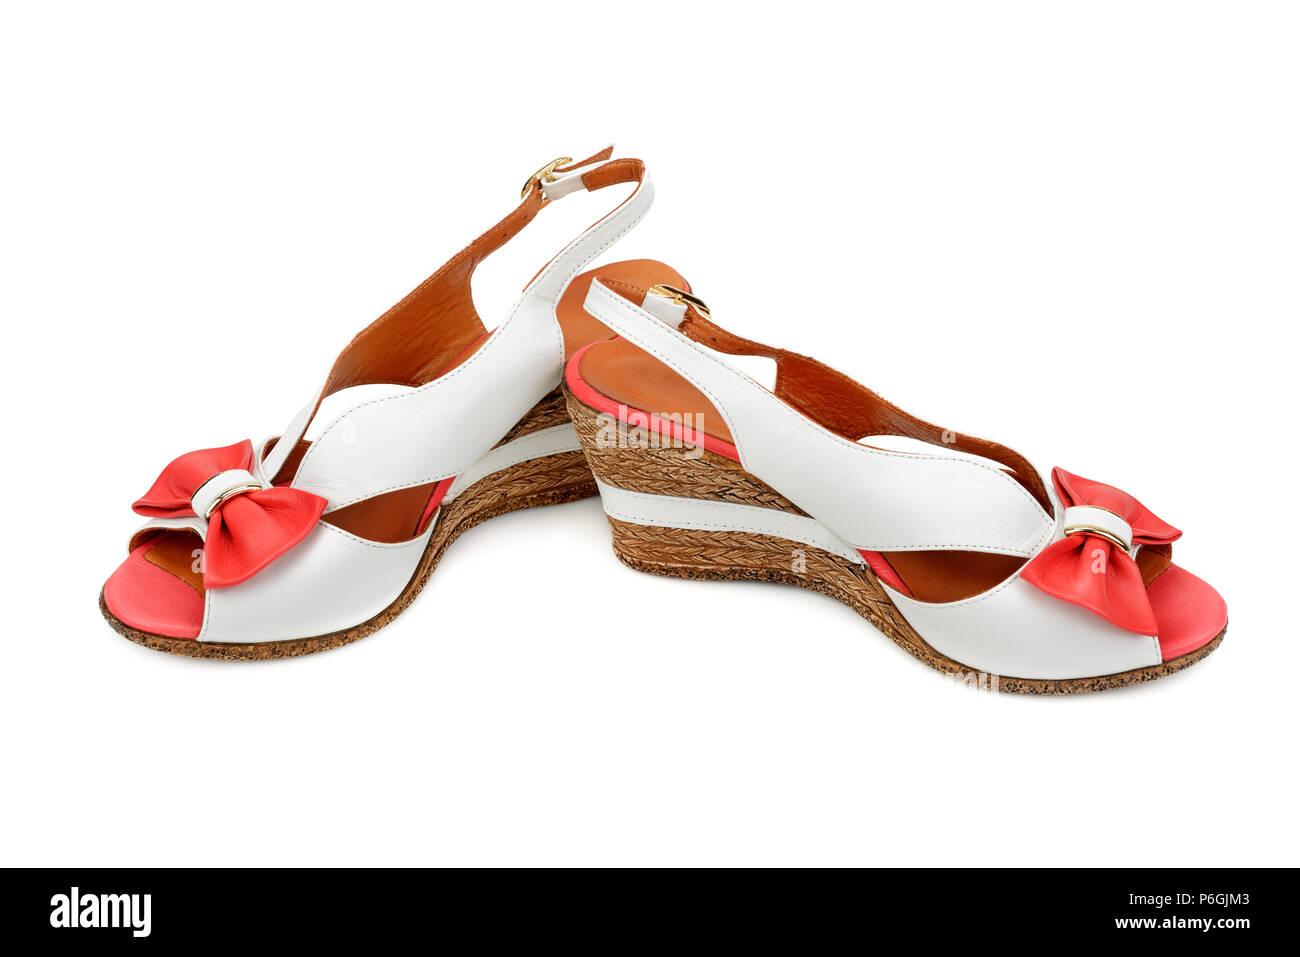 fe04b473f Platform Shoe Stock Photos & Platform Shoe Stock Images - Alamy